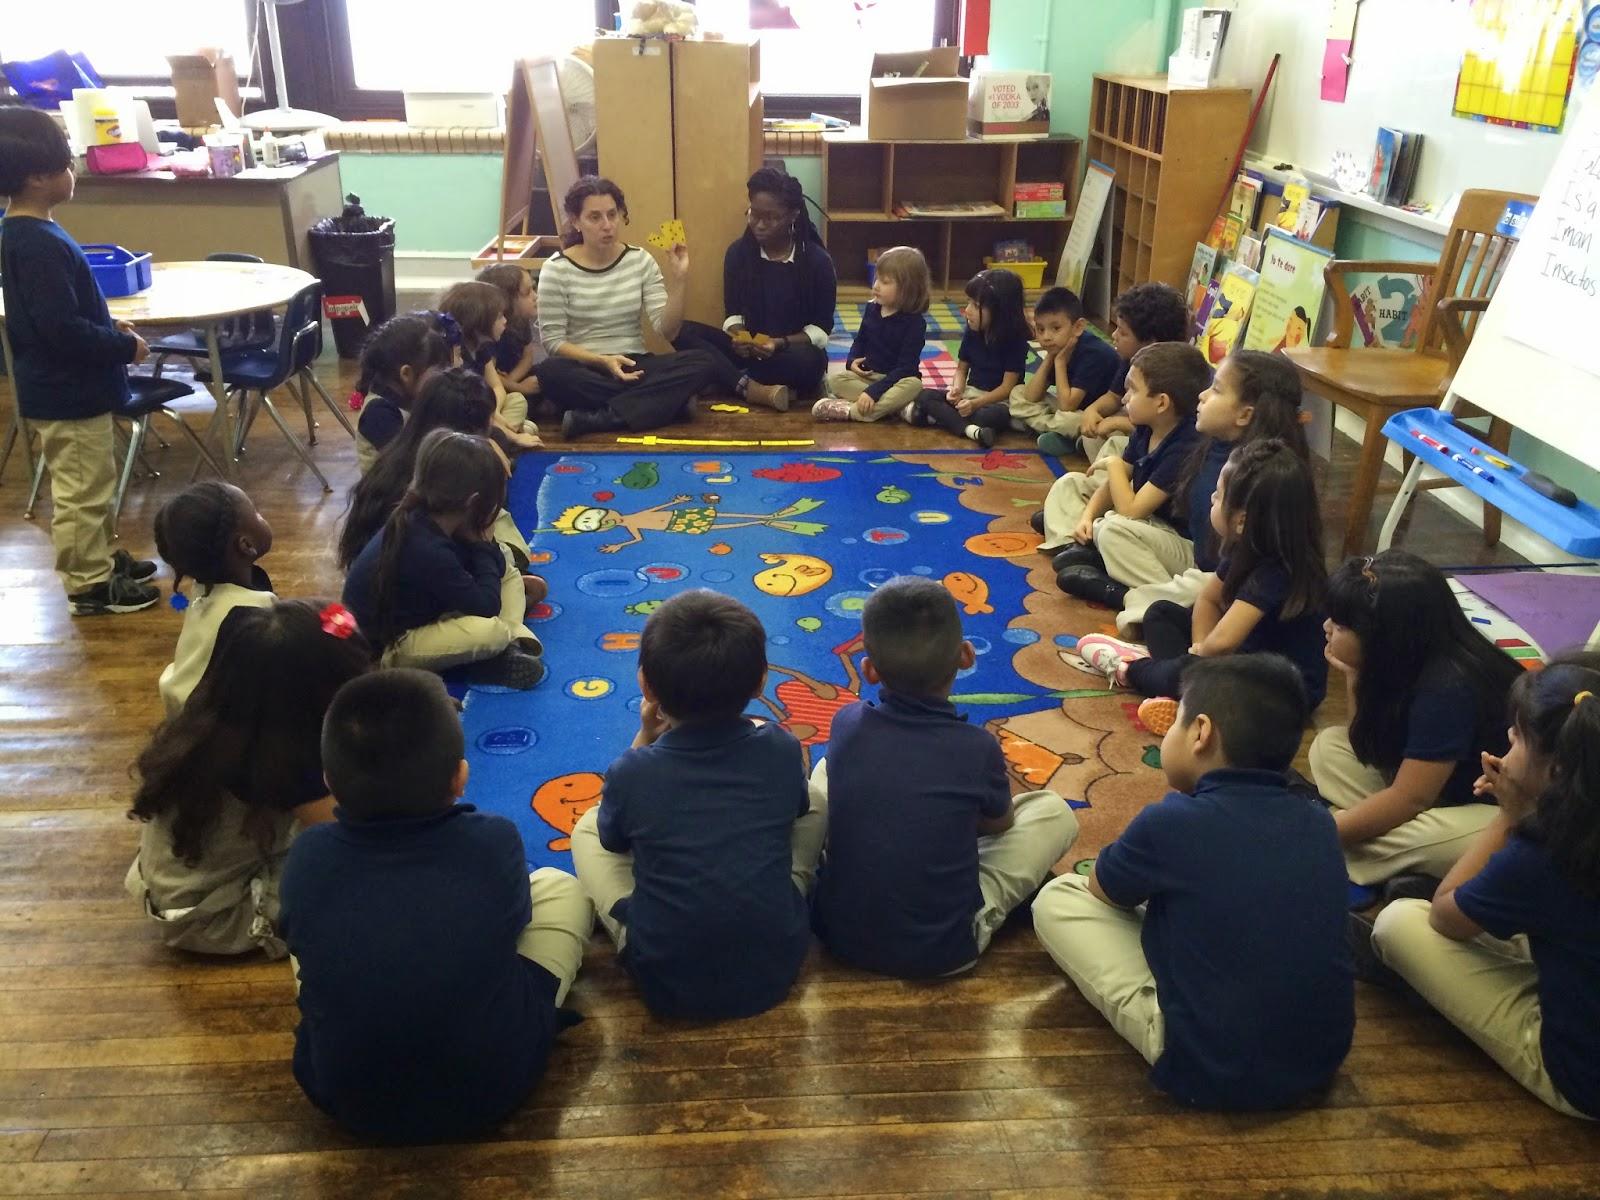 Southwark School K-8: May 2015